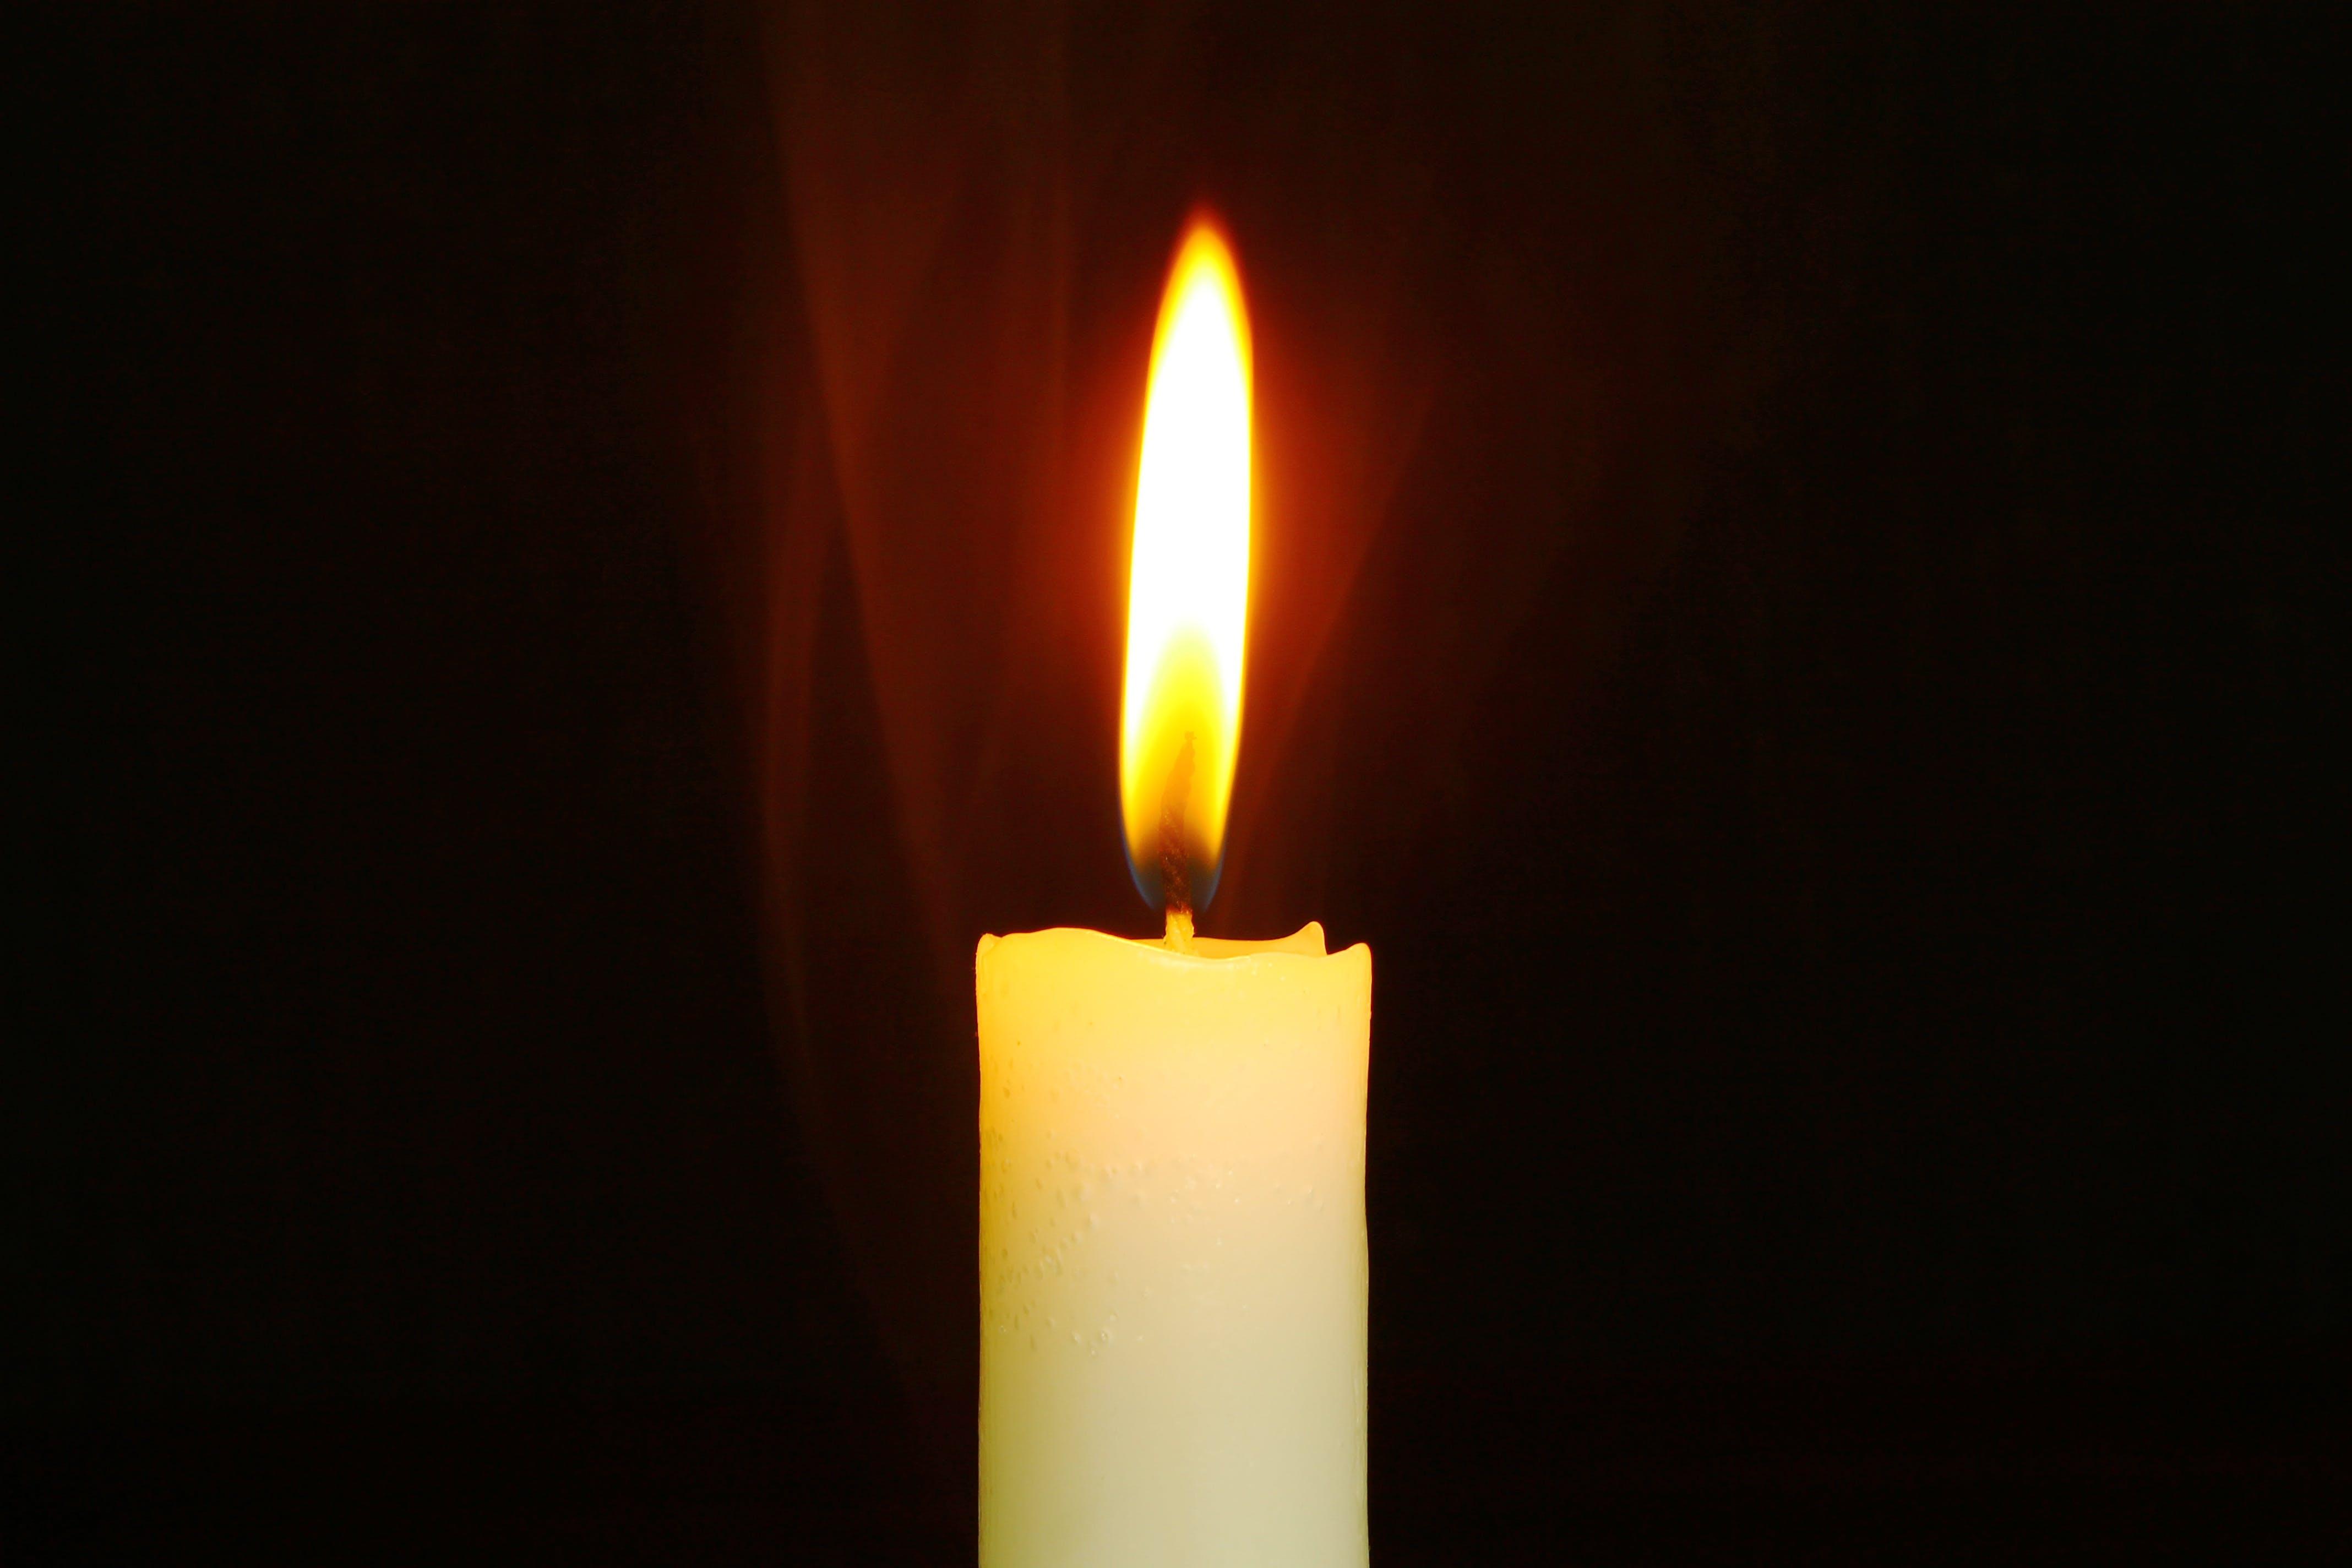 Kostenloses Stock Foto zu beleuchtet, brennen, dunkel, feier